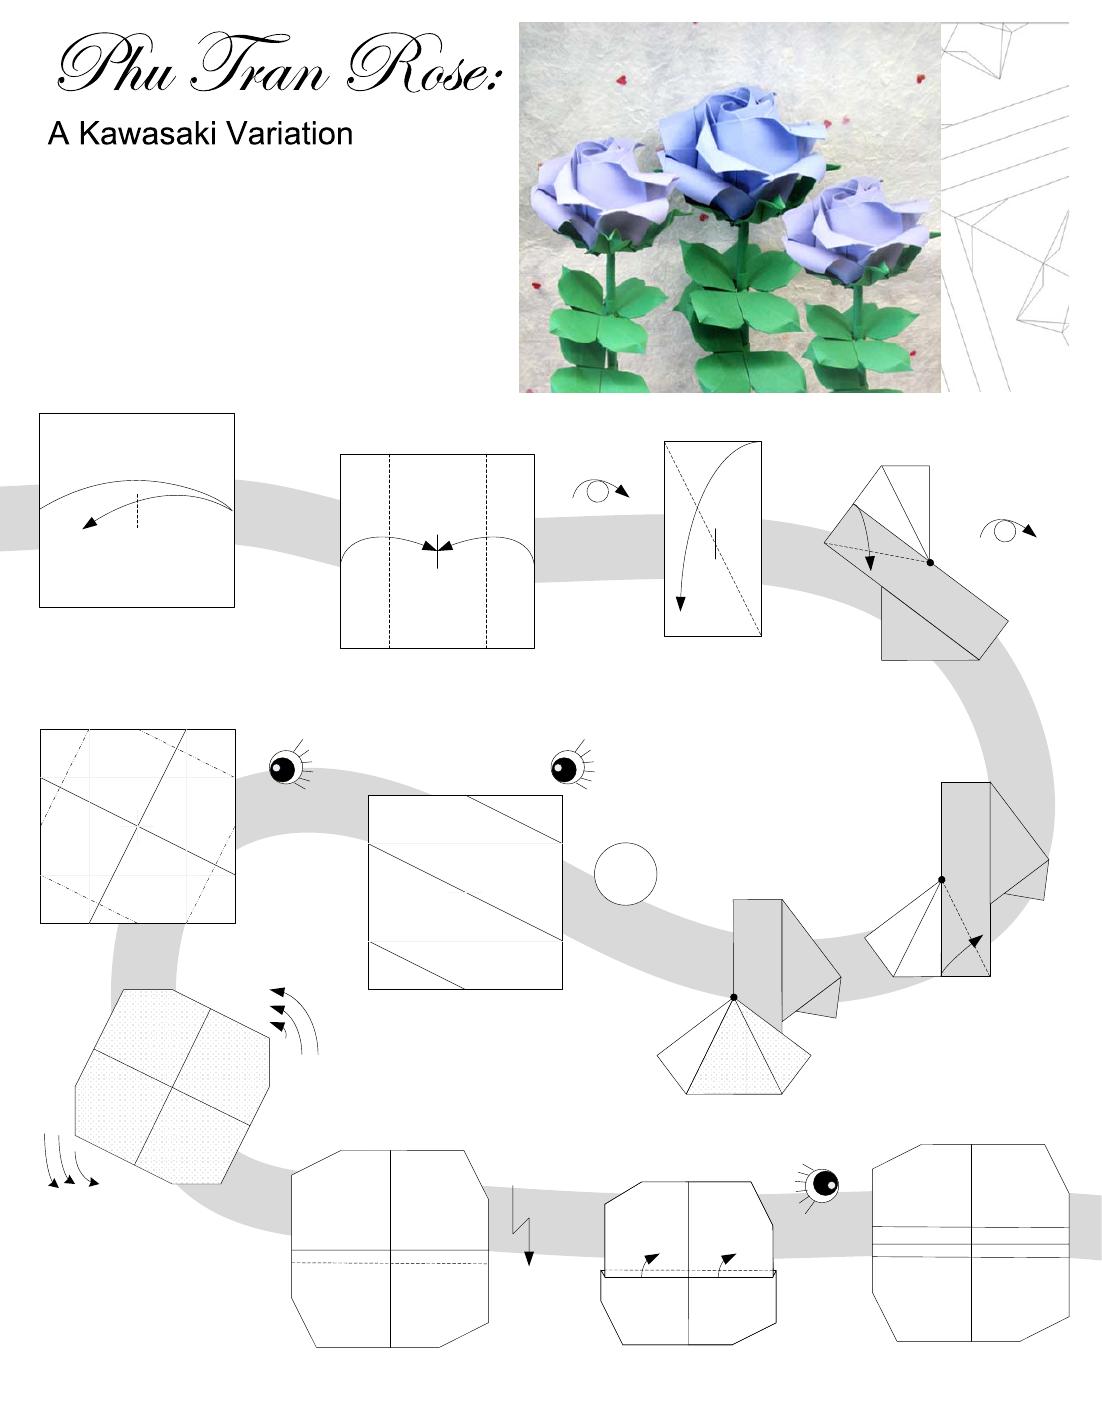 small resolution of origami rose diagram phu tran rose origami roses origami origami kawasaki rose diagrams origami pinterest